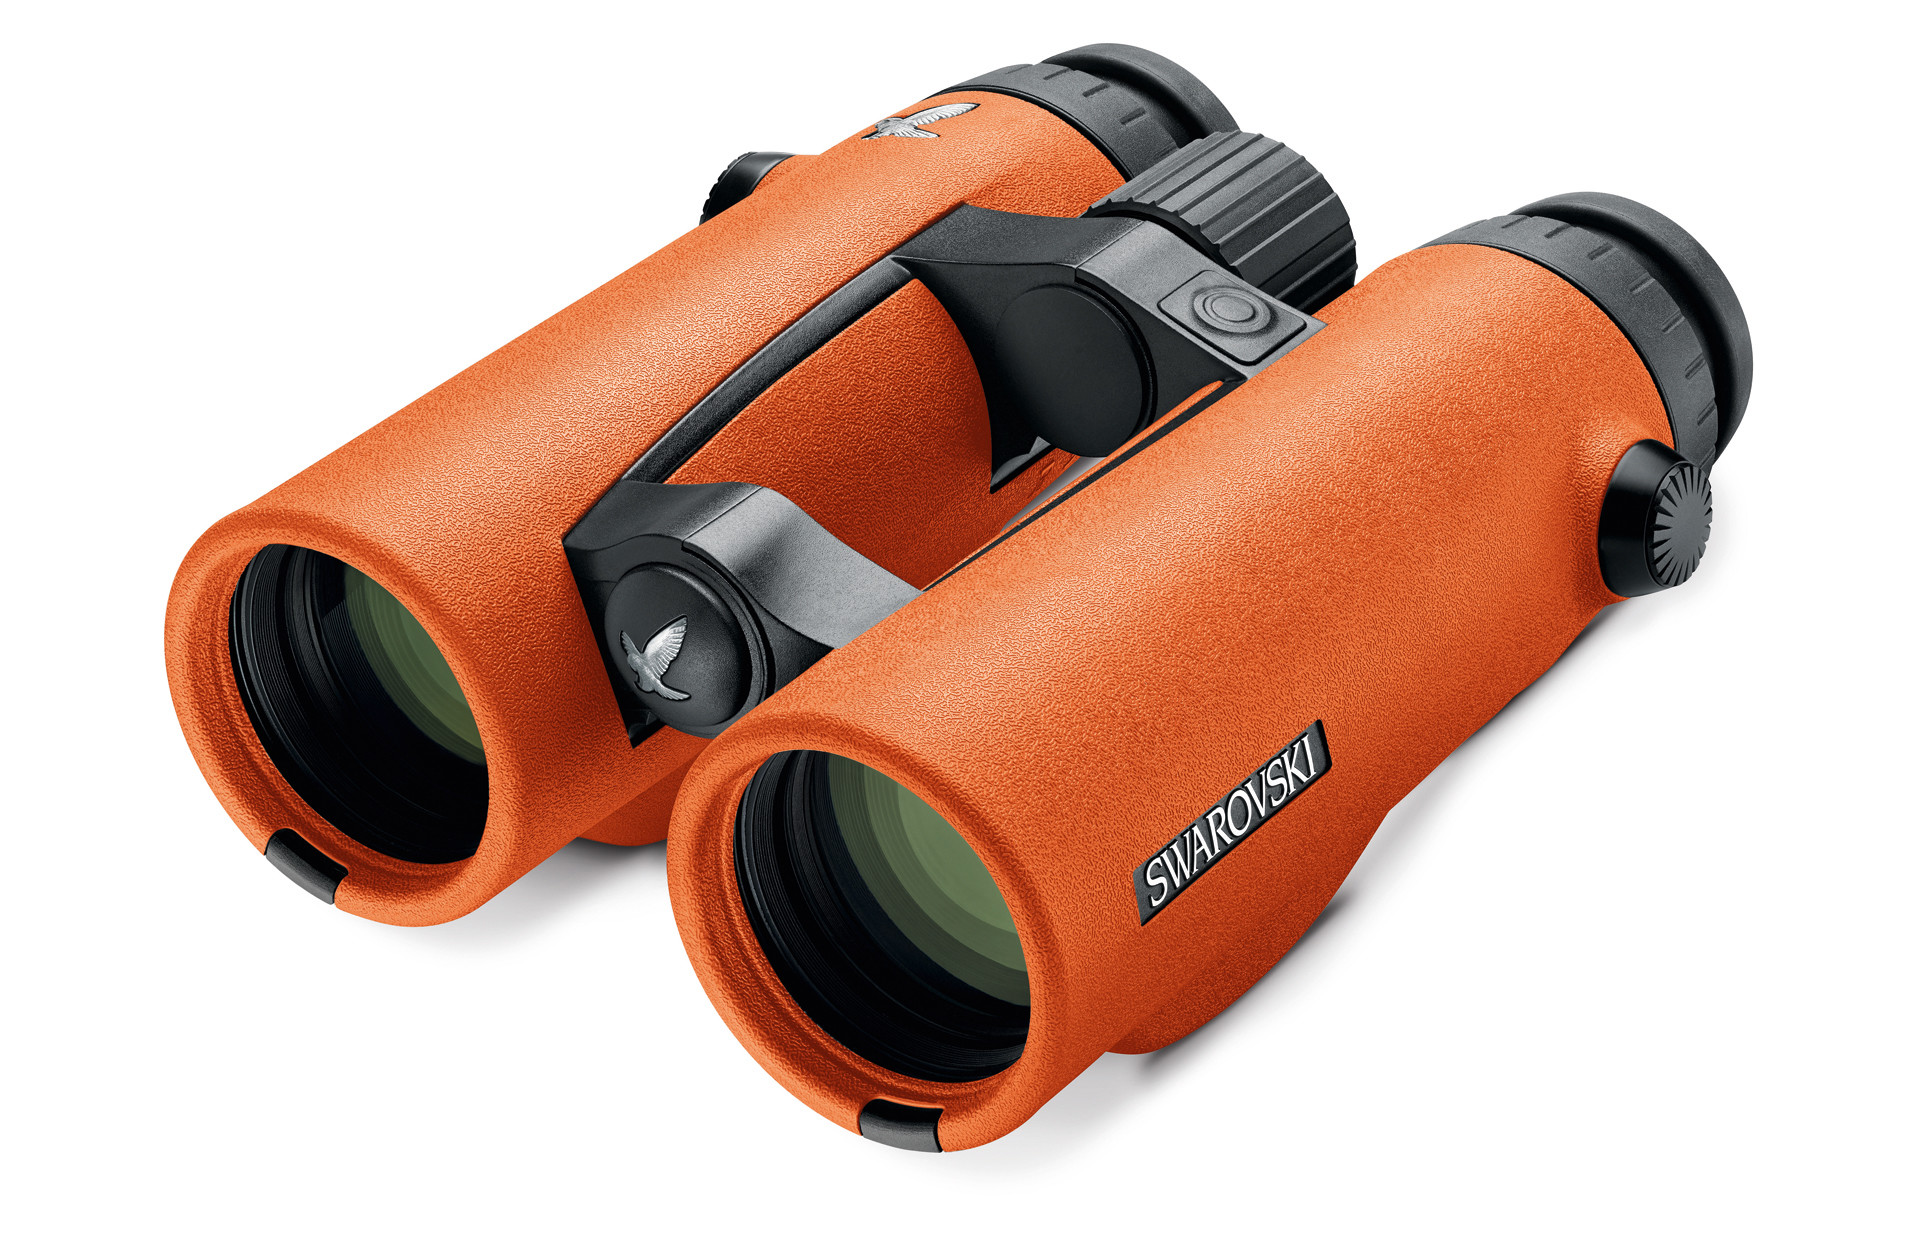 Swarovski Z8i Entfernungsmesser : Hunting equipment jagdausrüstung und zubehör swarovski z i